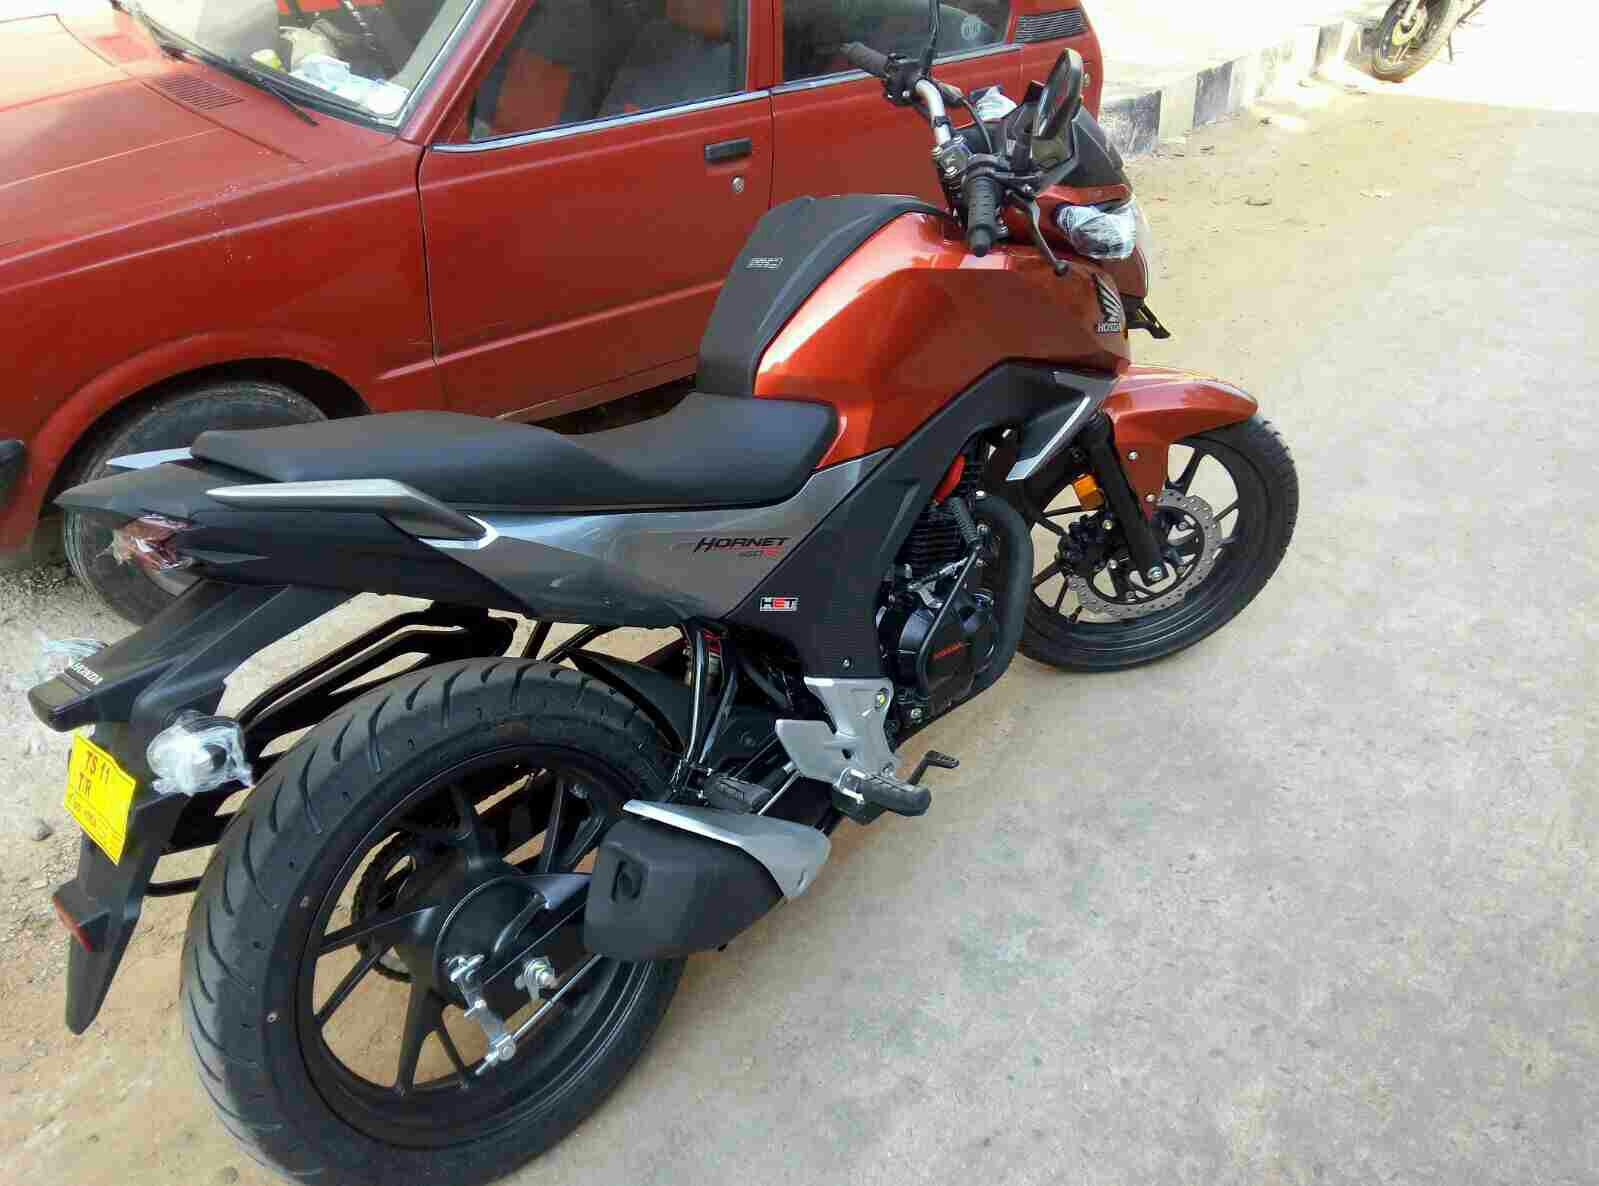 [Ownership Thread]: Honda CB Hornet 160R Owners Experiences